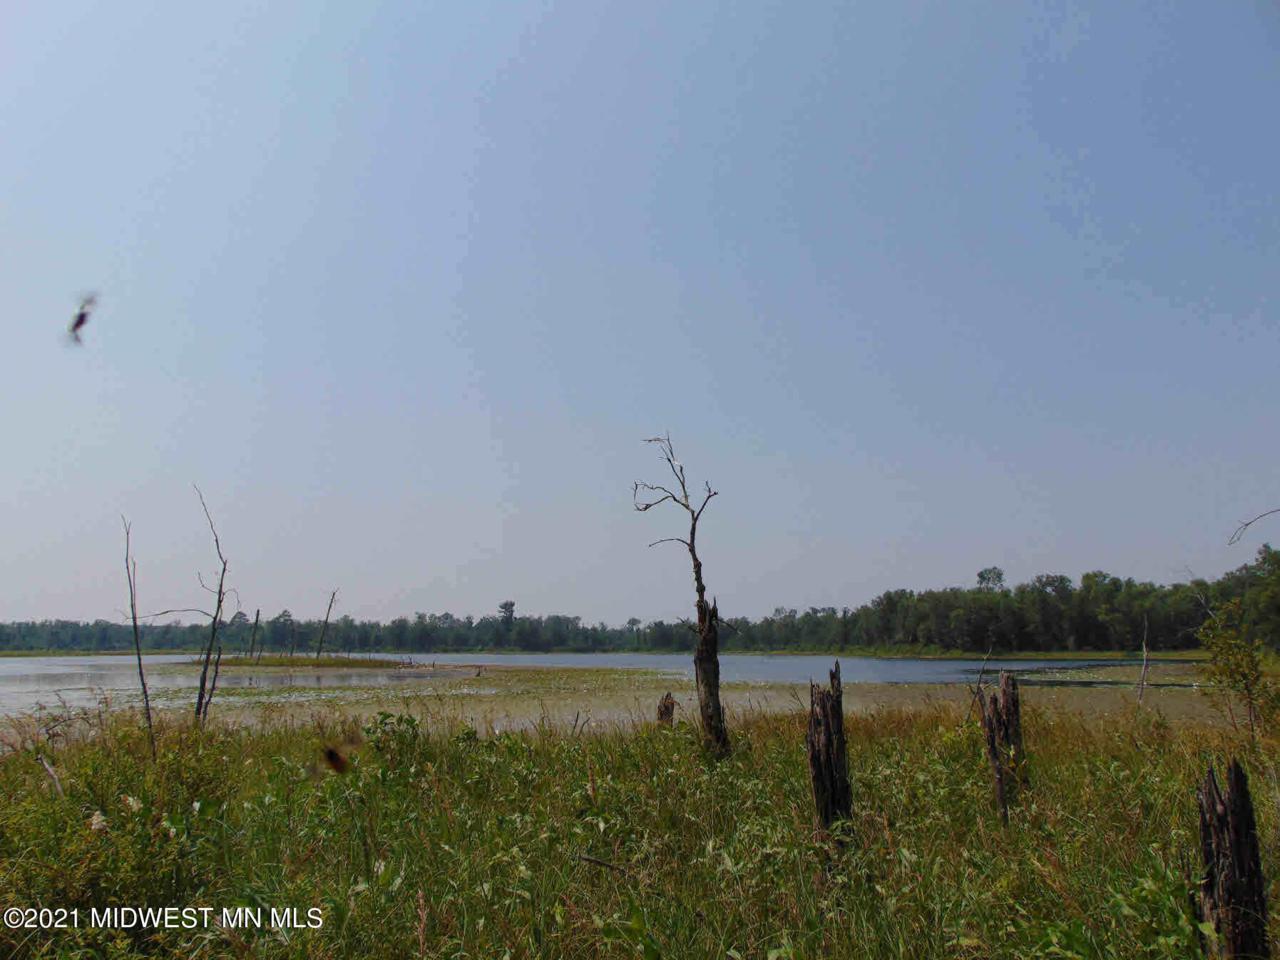 https://bt-photos.global.ssl.fastly.net/lakescountry/1280_boomver_1_20-34619-2.jpg